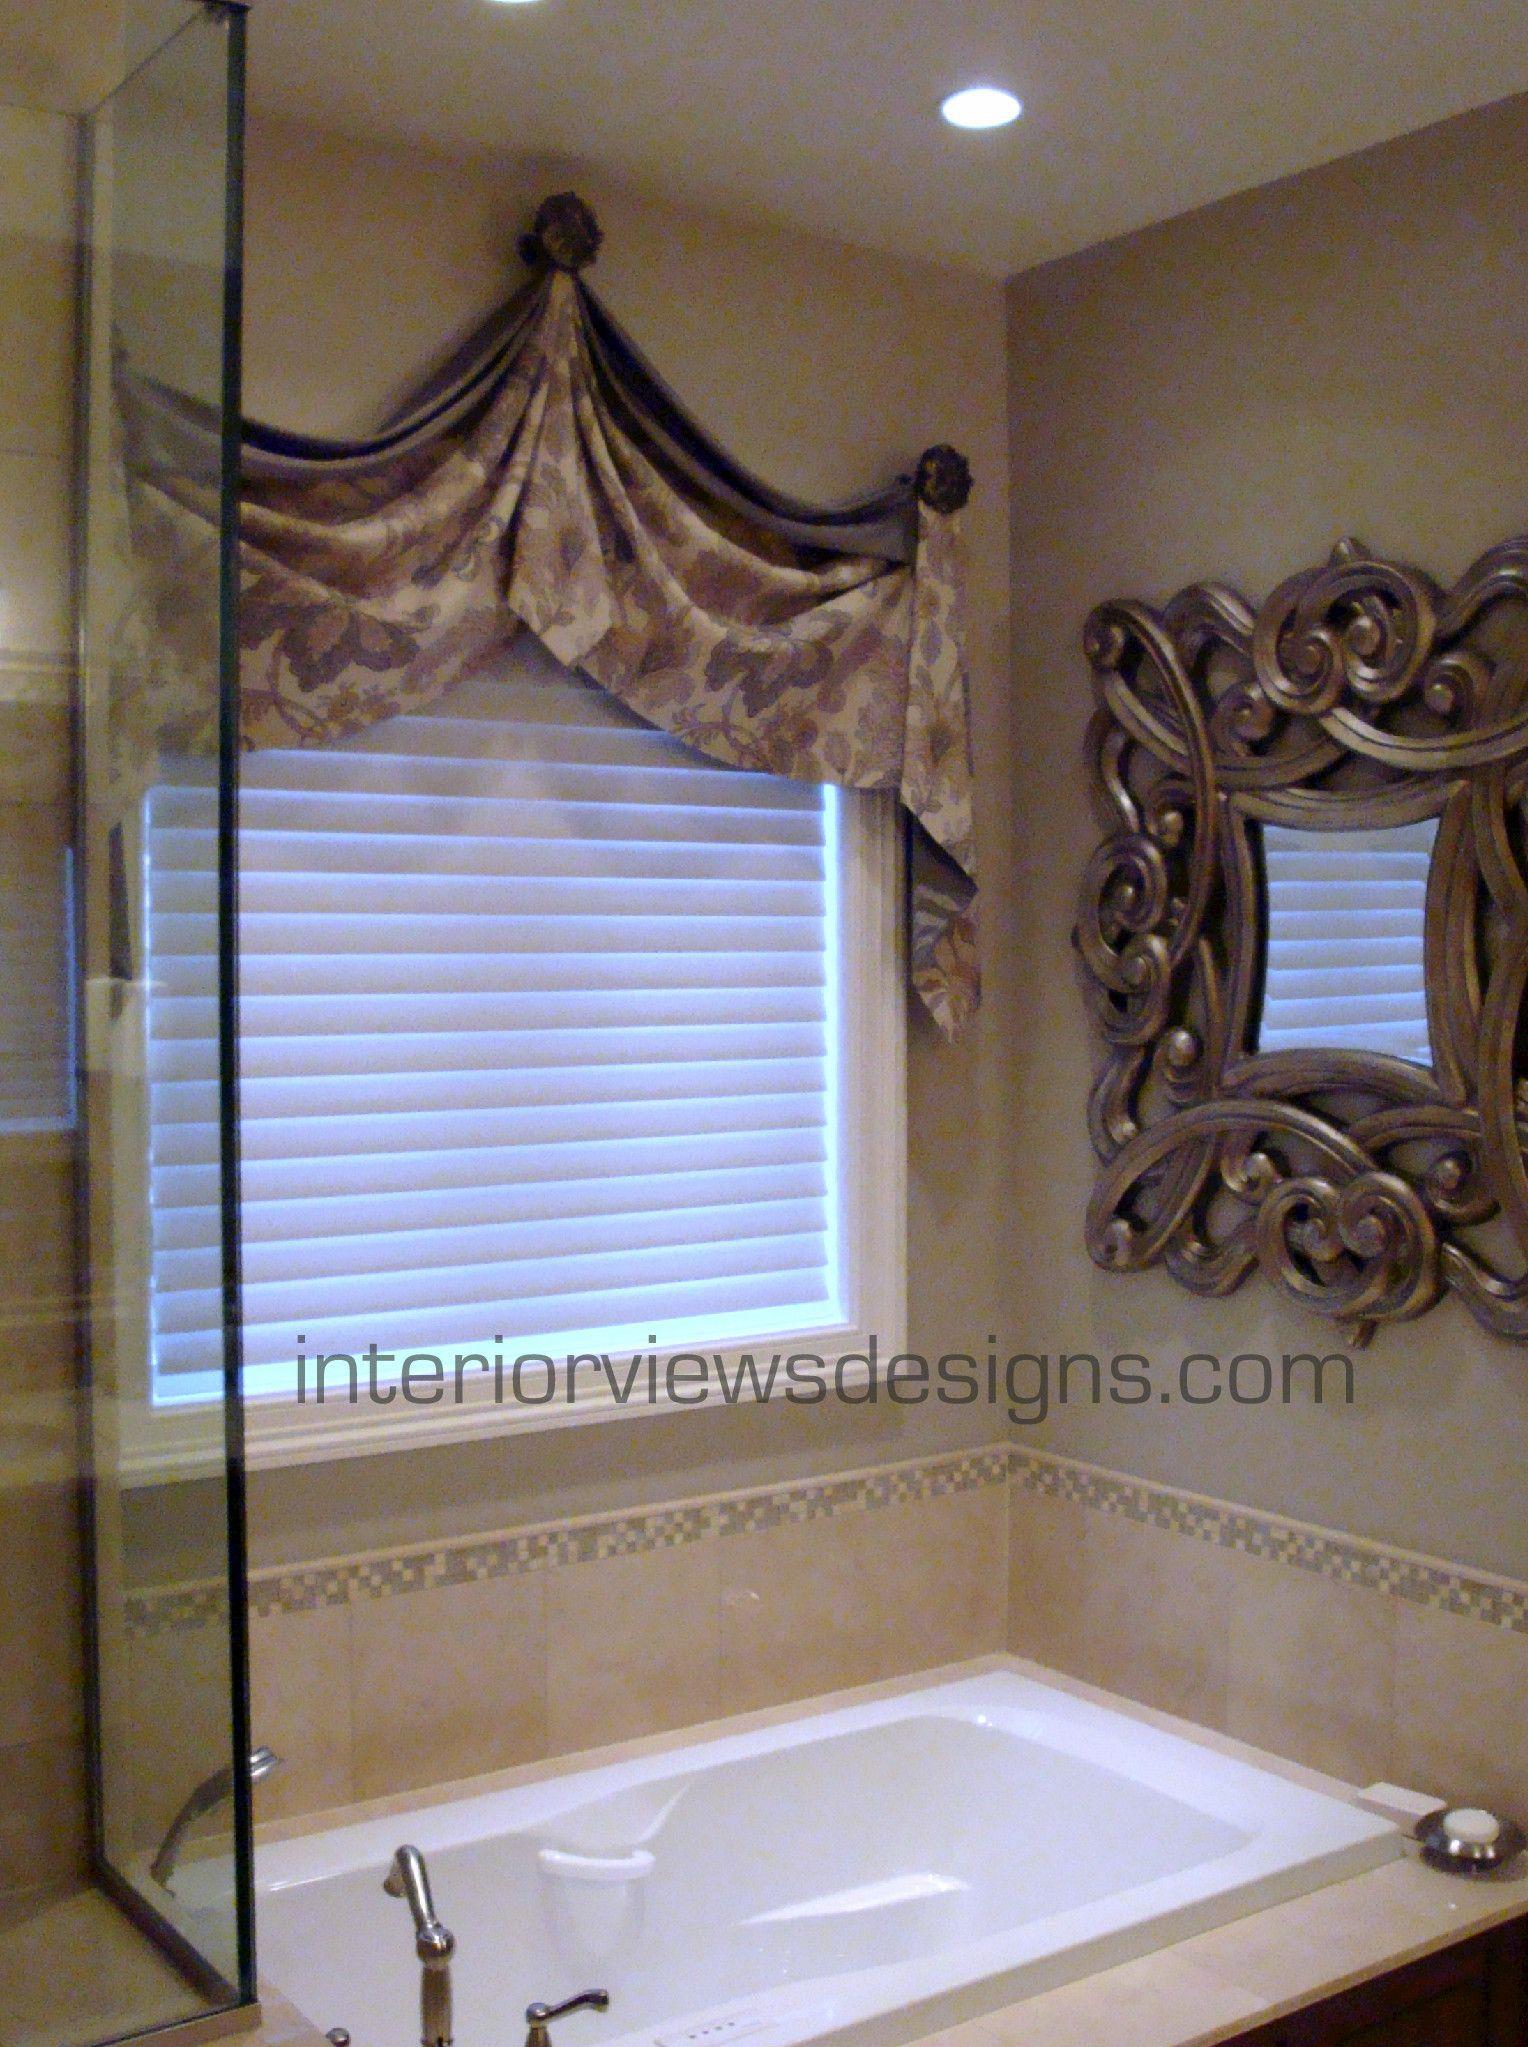 Creating Luxury Over The Bath Tub Area Restroom Decor Master